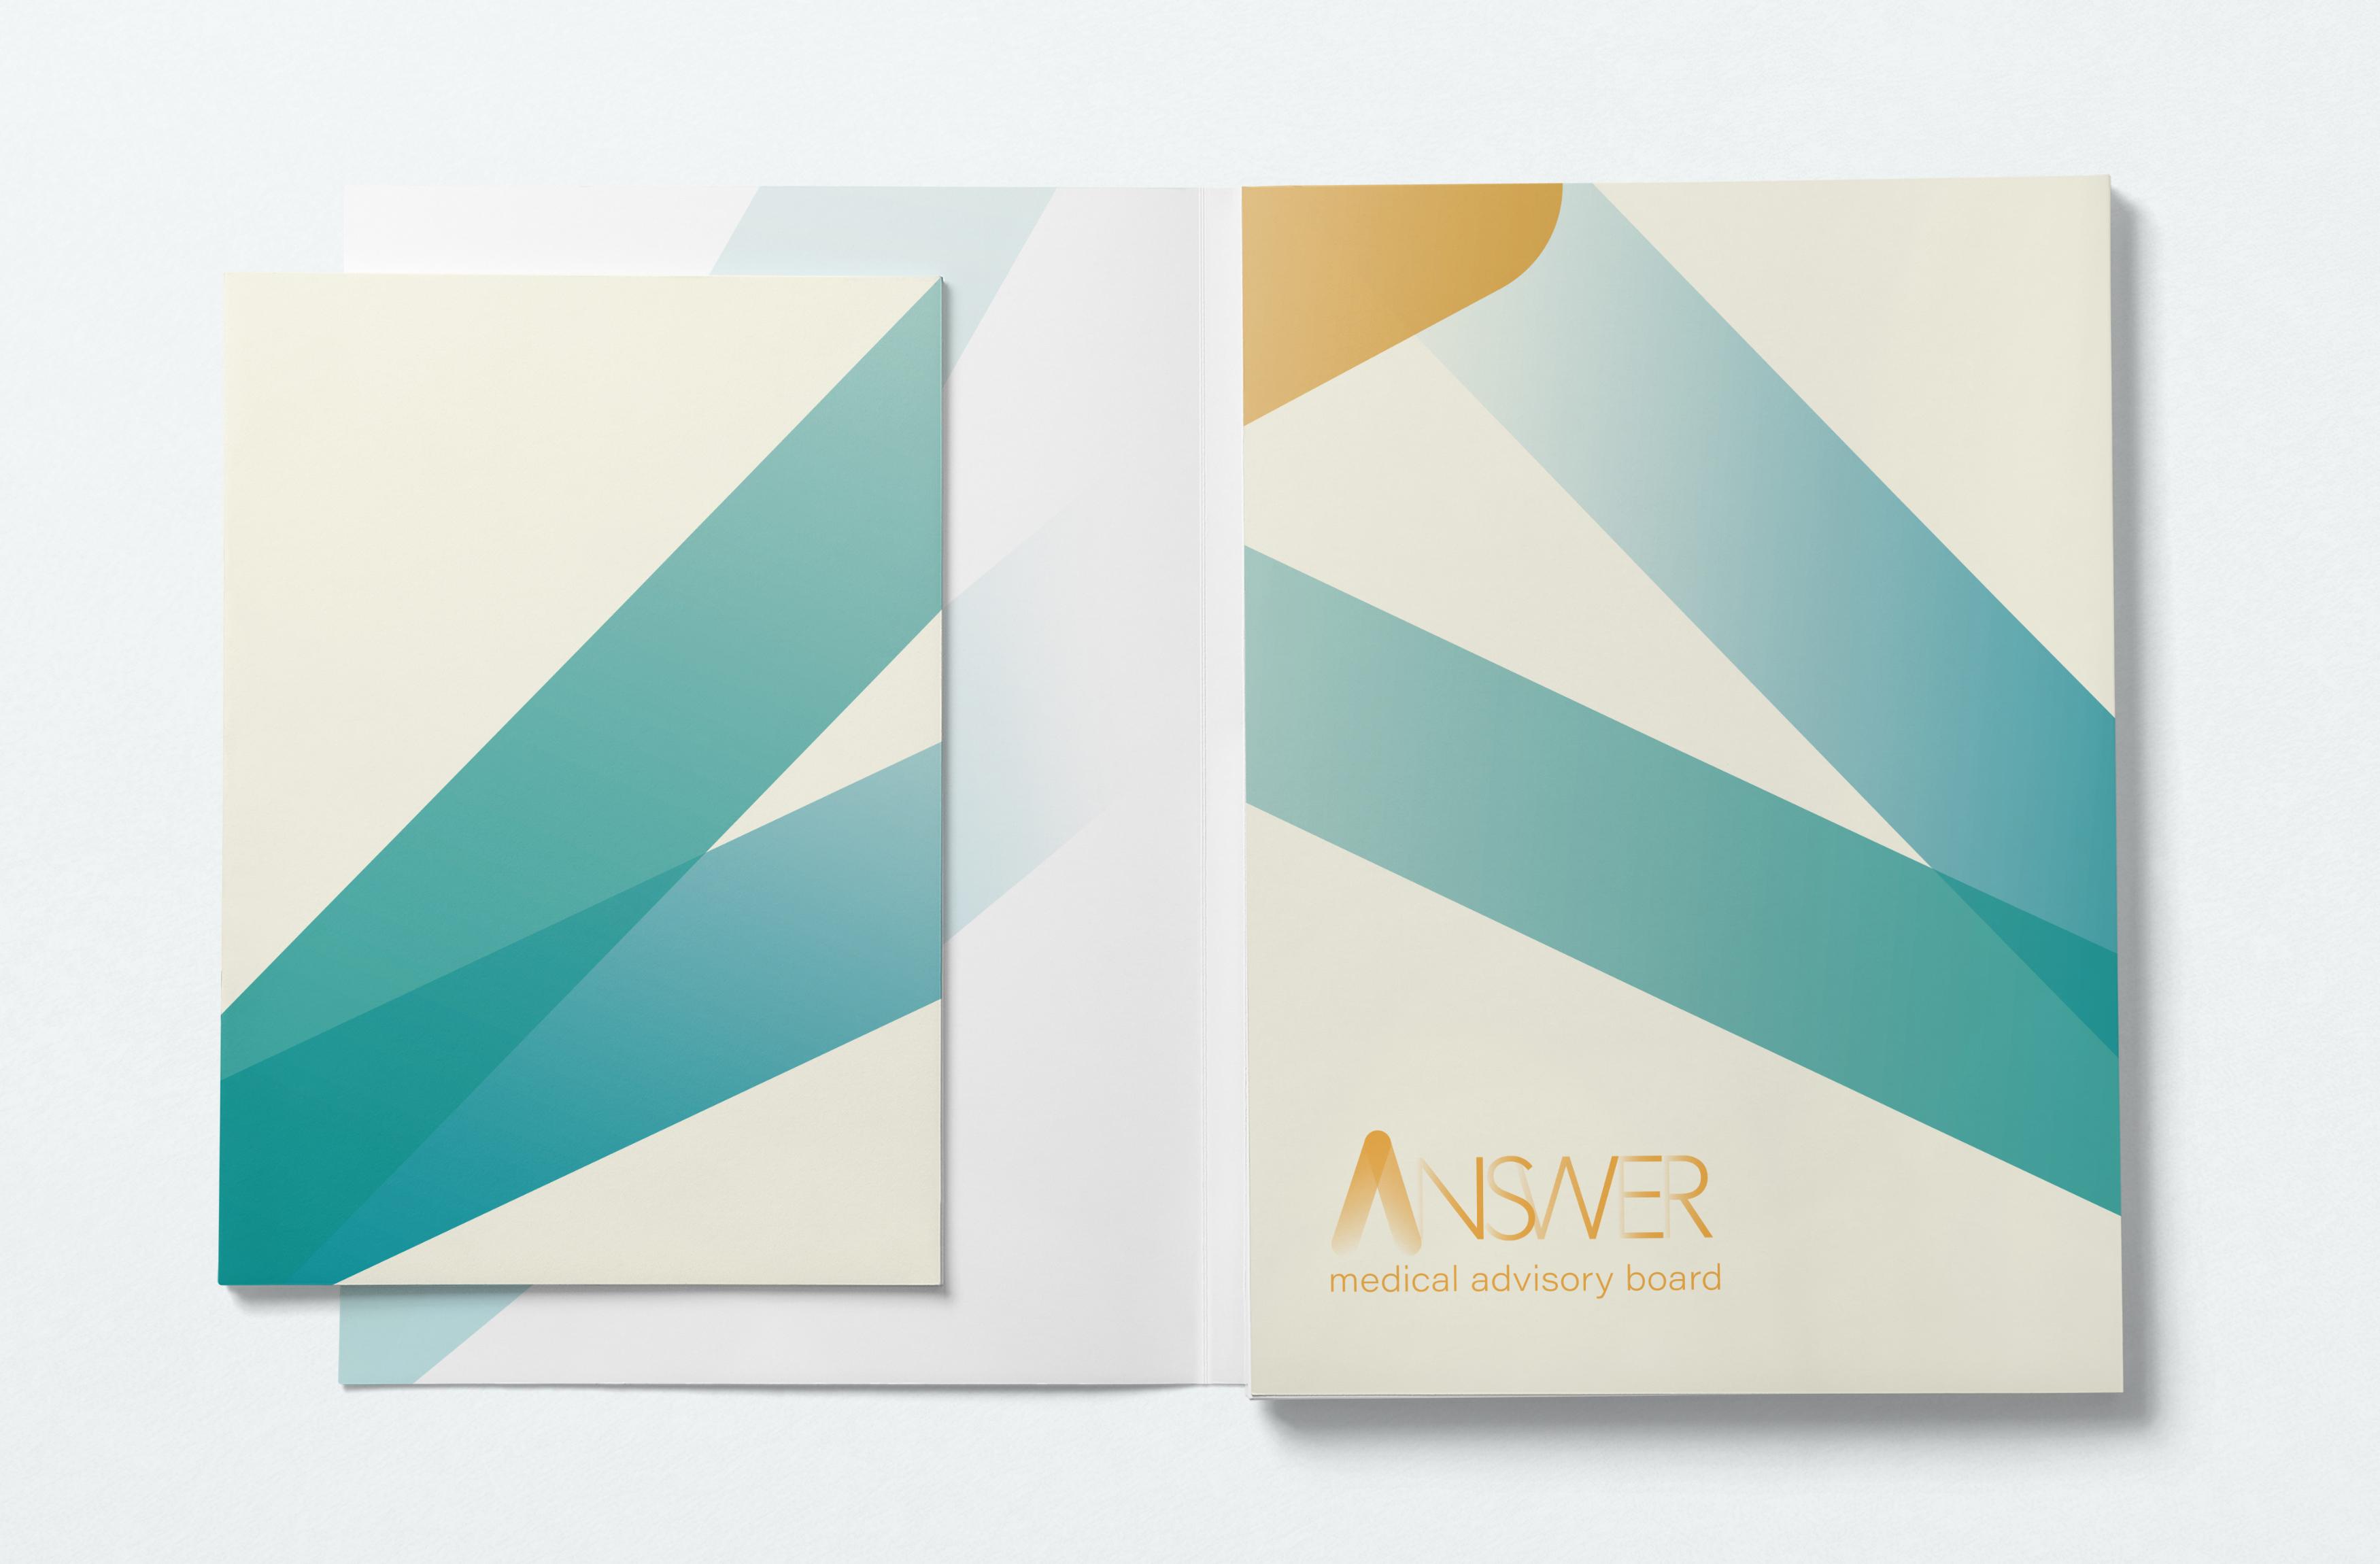 answer-folder